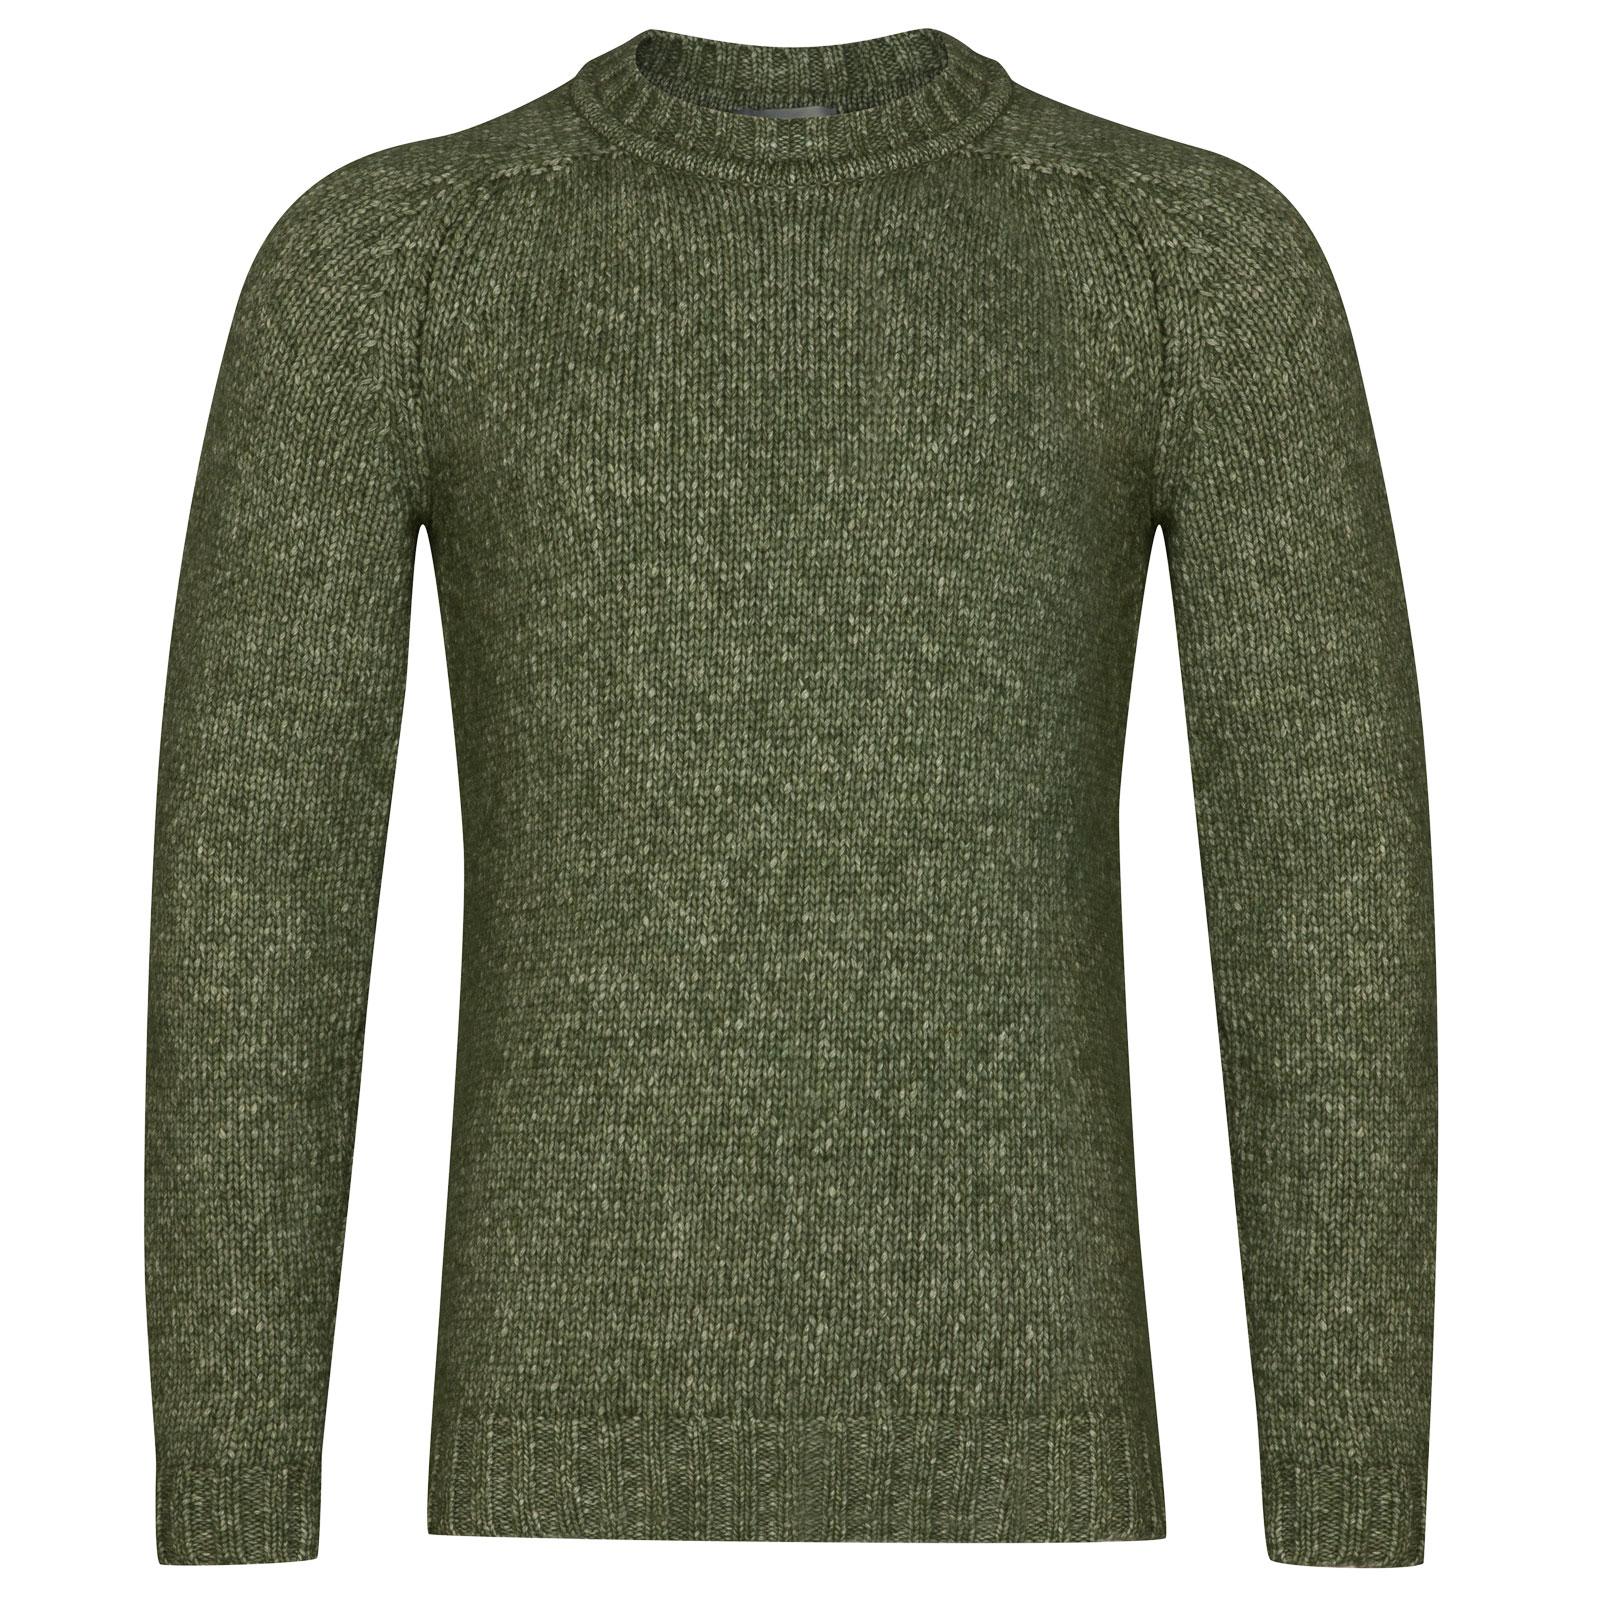 John Smedley storr Alpaca, Wool & Cotton Pullover in Kielder Green-XXL